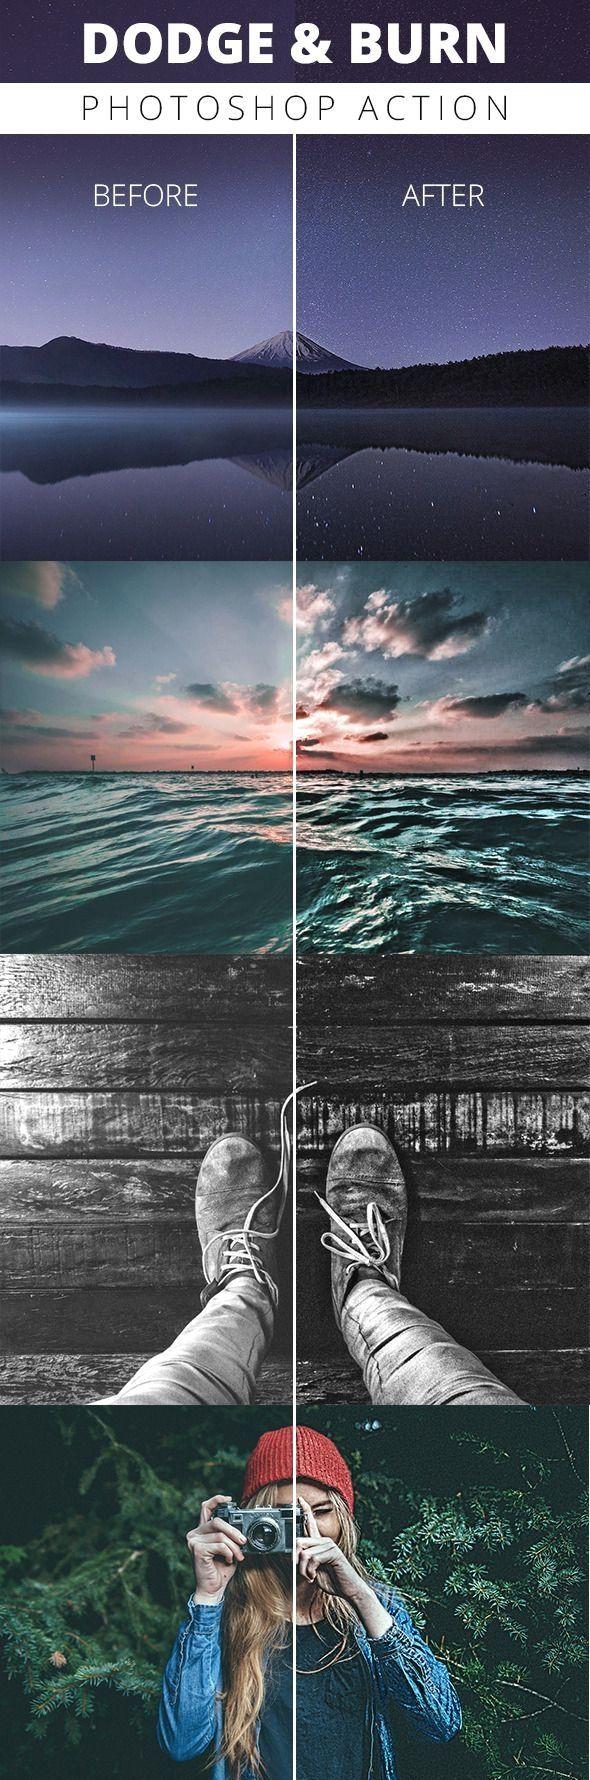 Fotografie-Tricks. Fantasievolle digitale … #Ph…